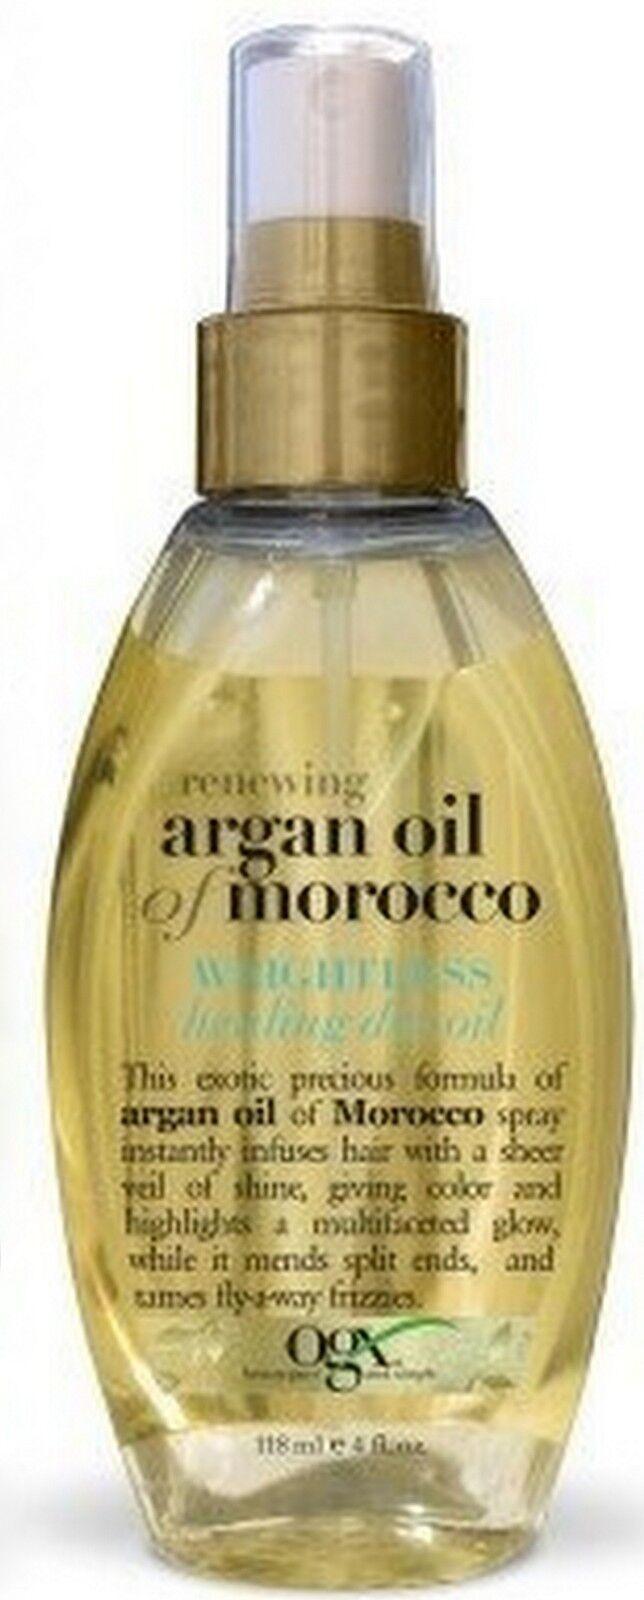 OGX Organix Argan Oil of Morocco WEIGHTLESS Healing 4oz